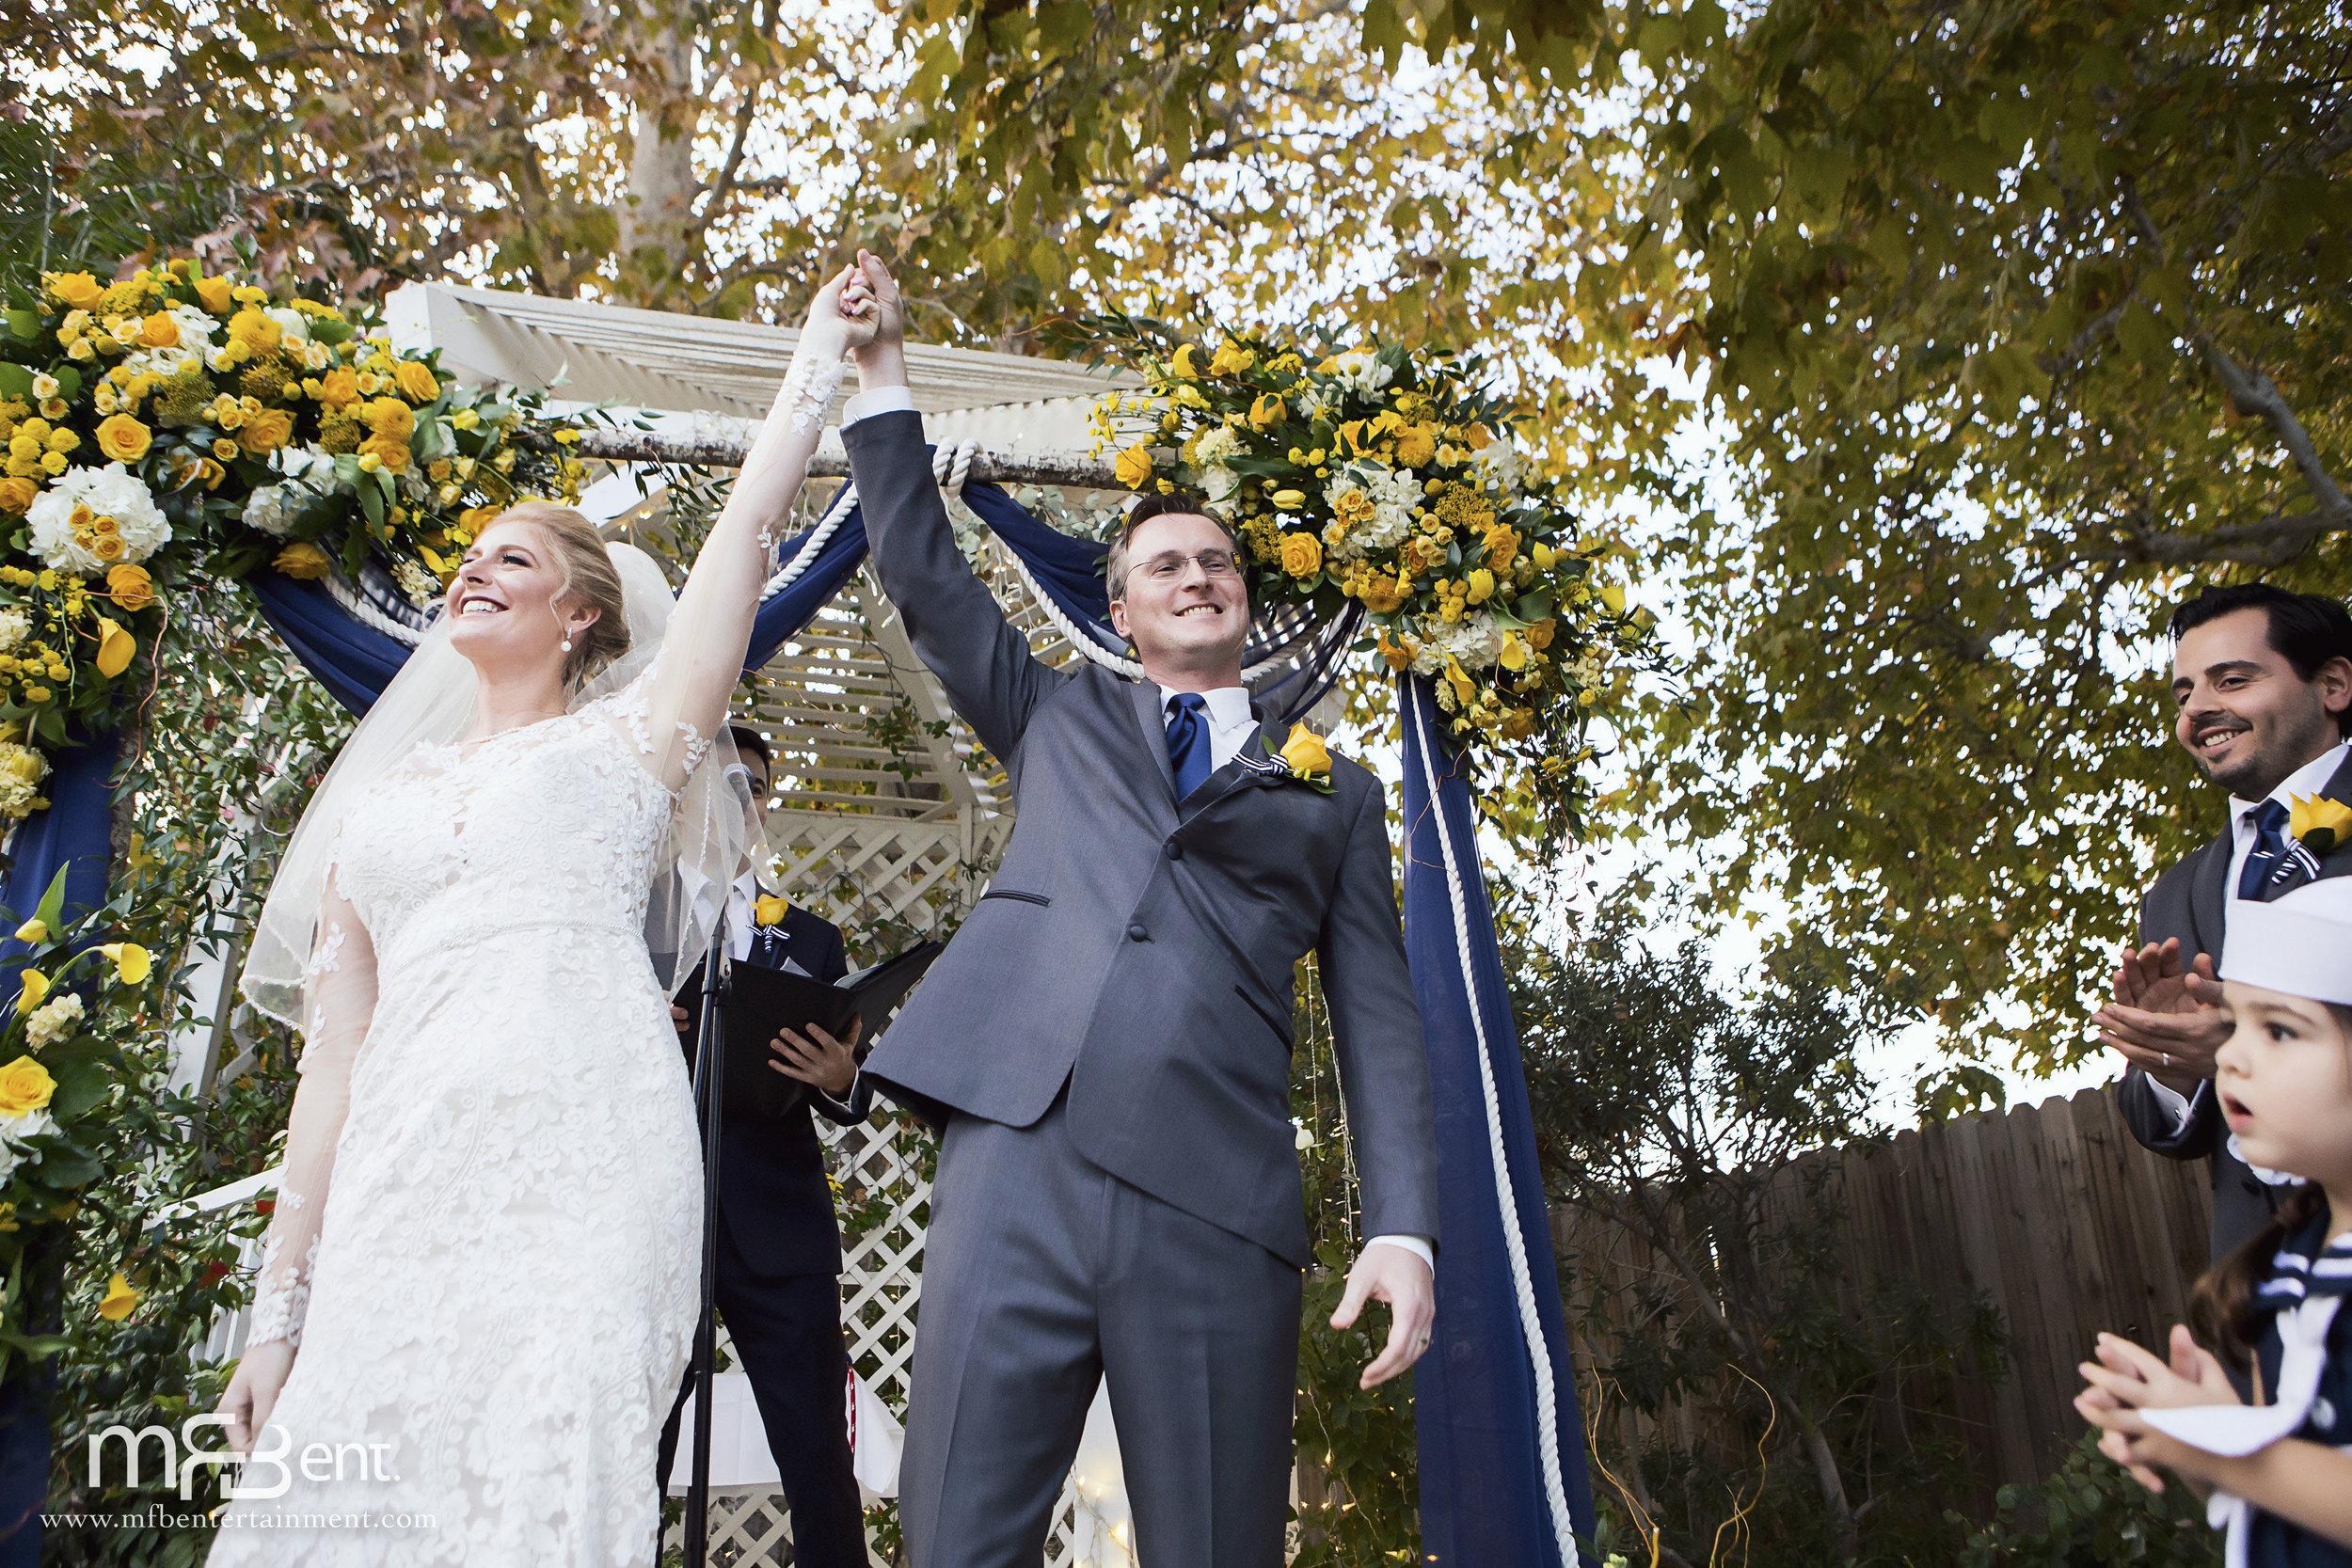 PIOTR CHELSEA WEDDING-CEREMONY-0139 L.jpg